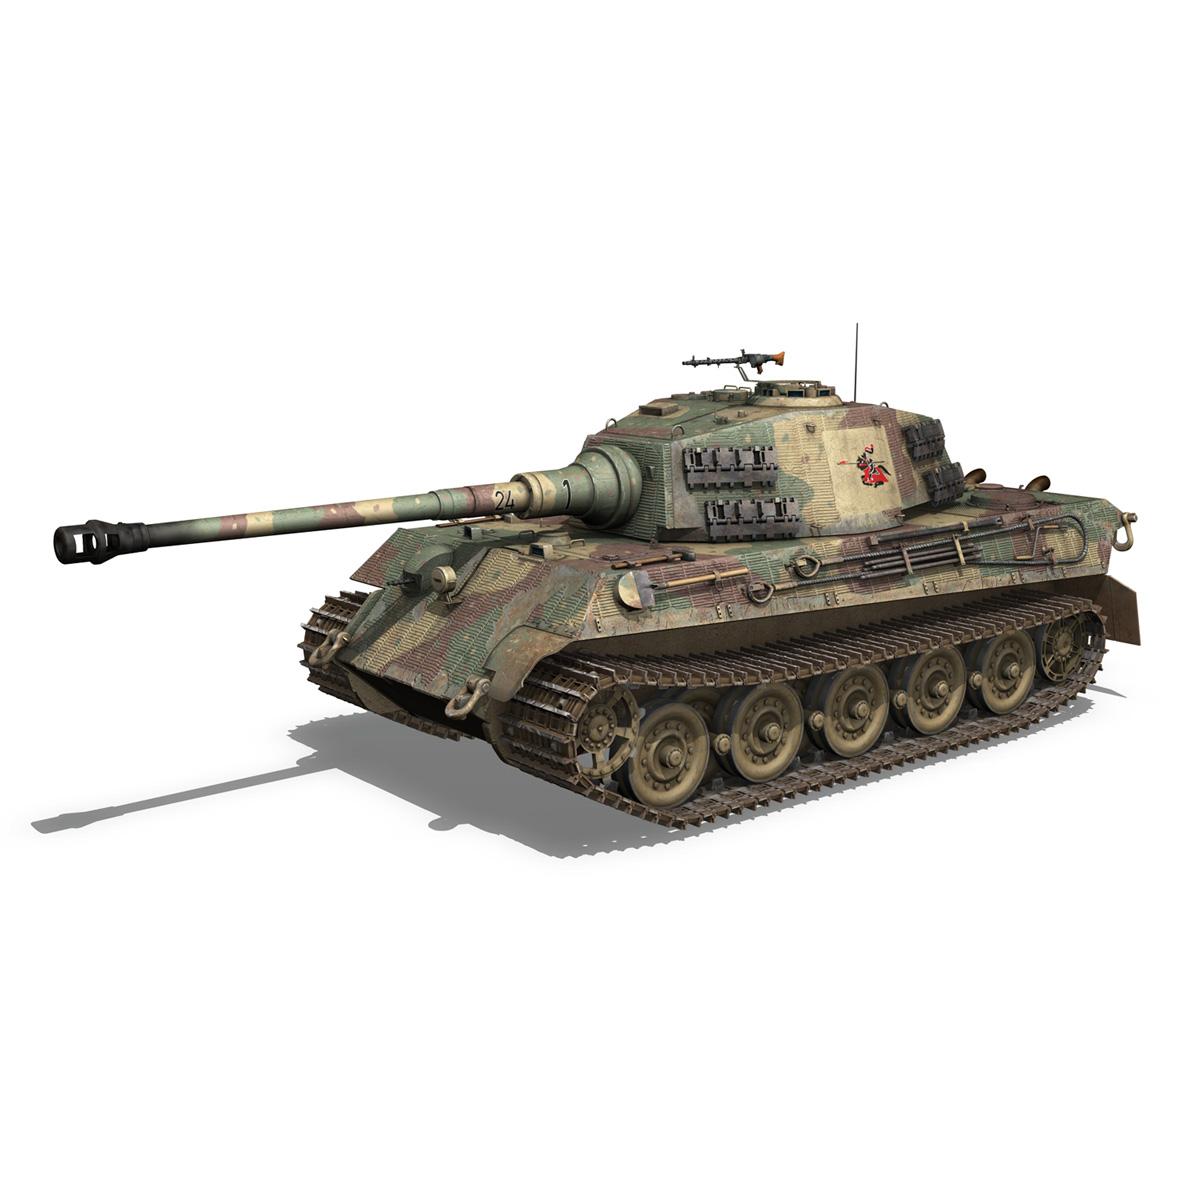 Panzerkampfwagen VI - Ausf B - Tiger II - 124 3d model 3ds c4d lwo lws lw obj 273756